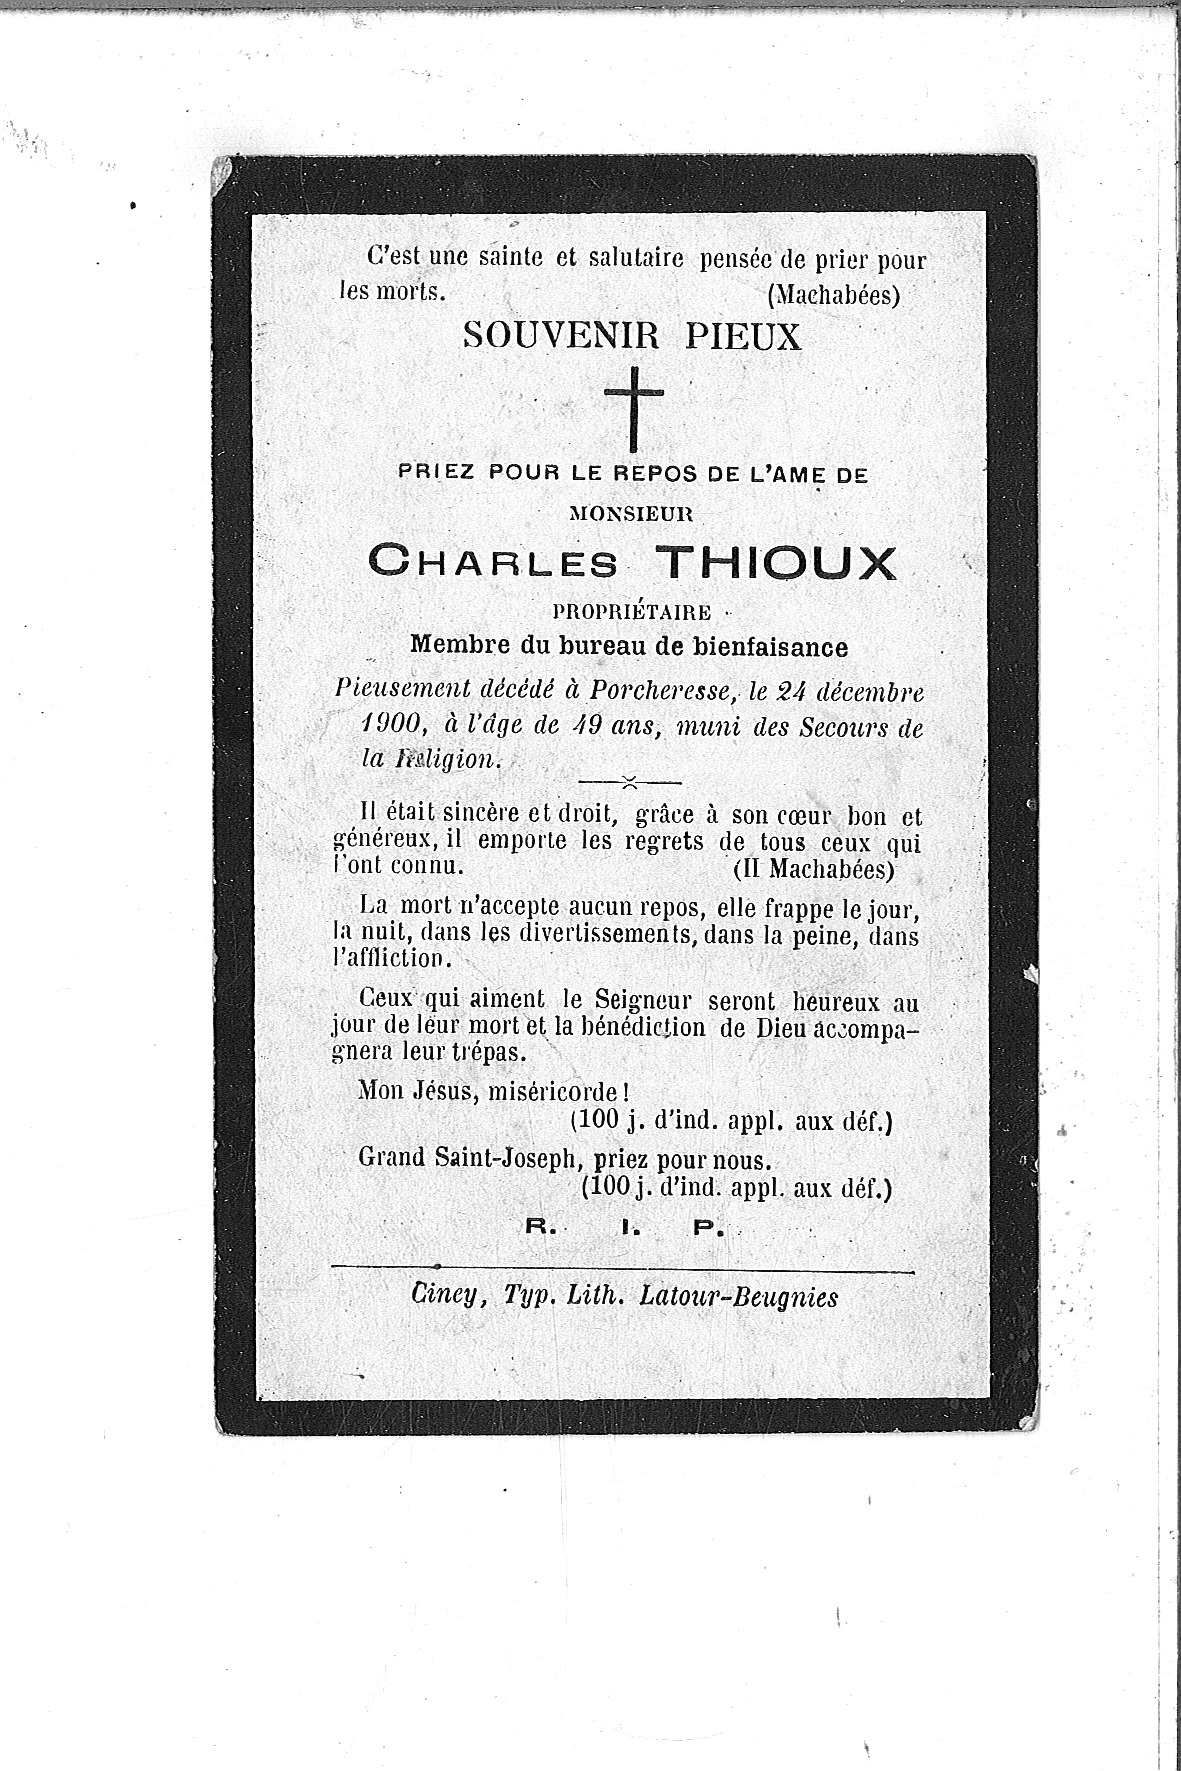 Charles(1900)20140825083222_00132.jpg